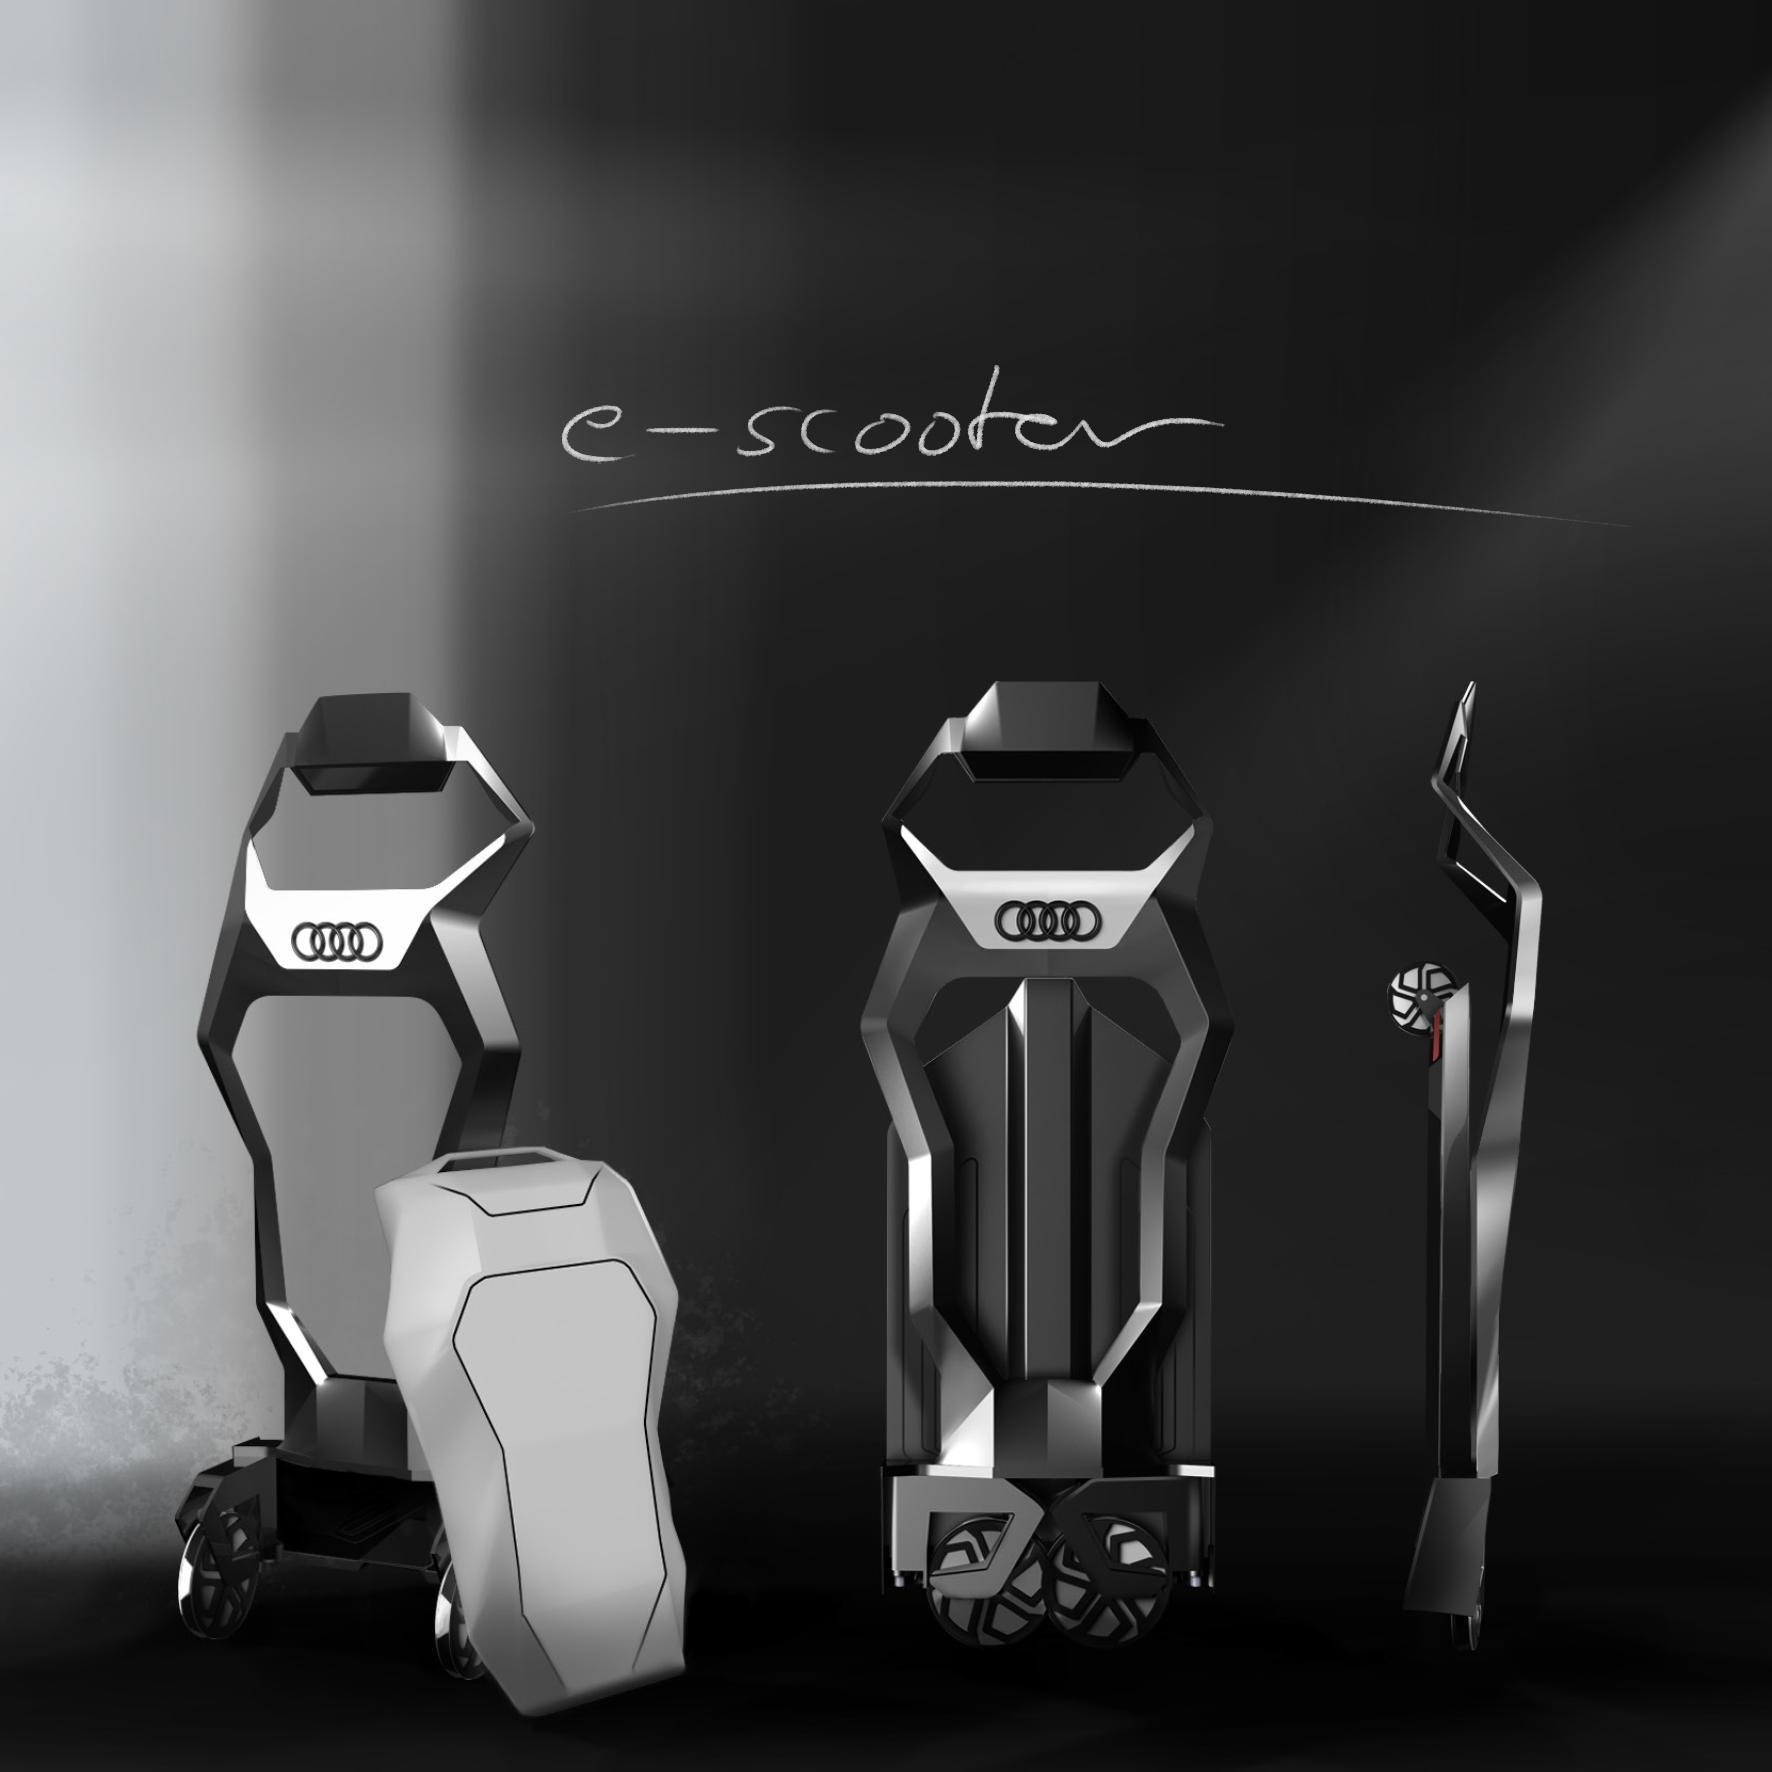 Audi E-Scooter